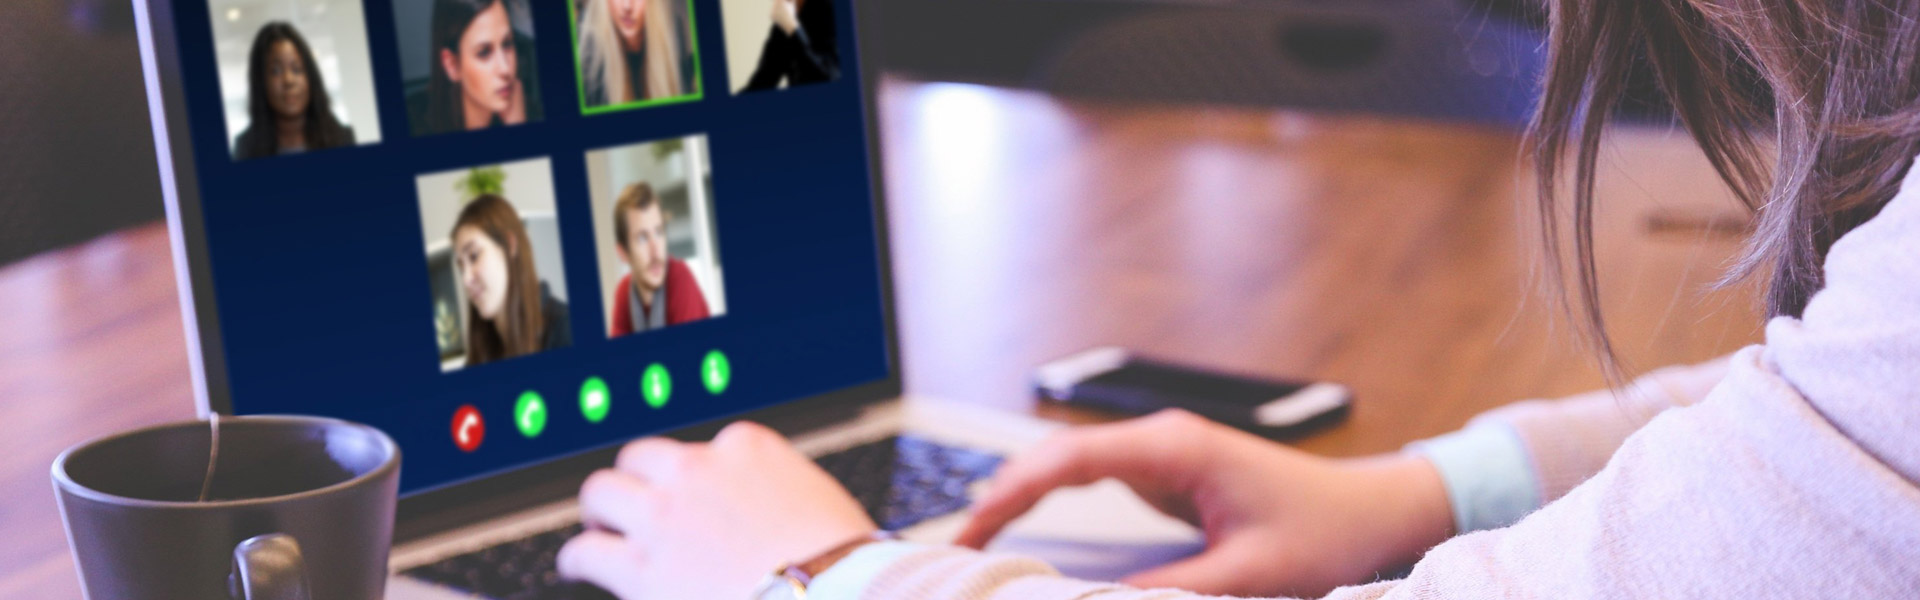 Videokonferenz Beratung